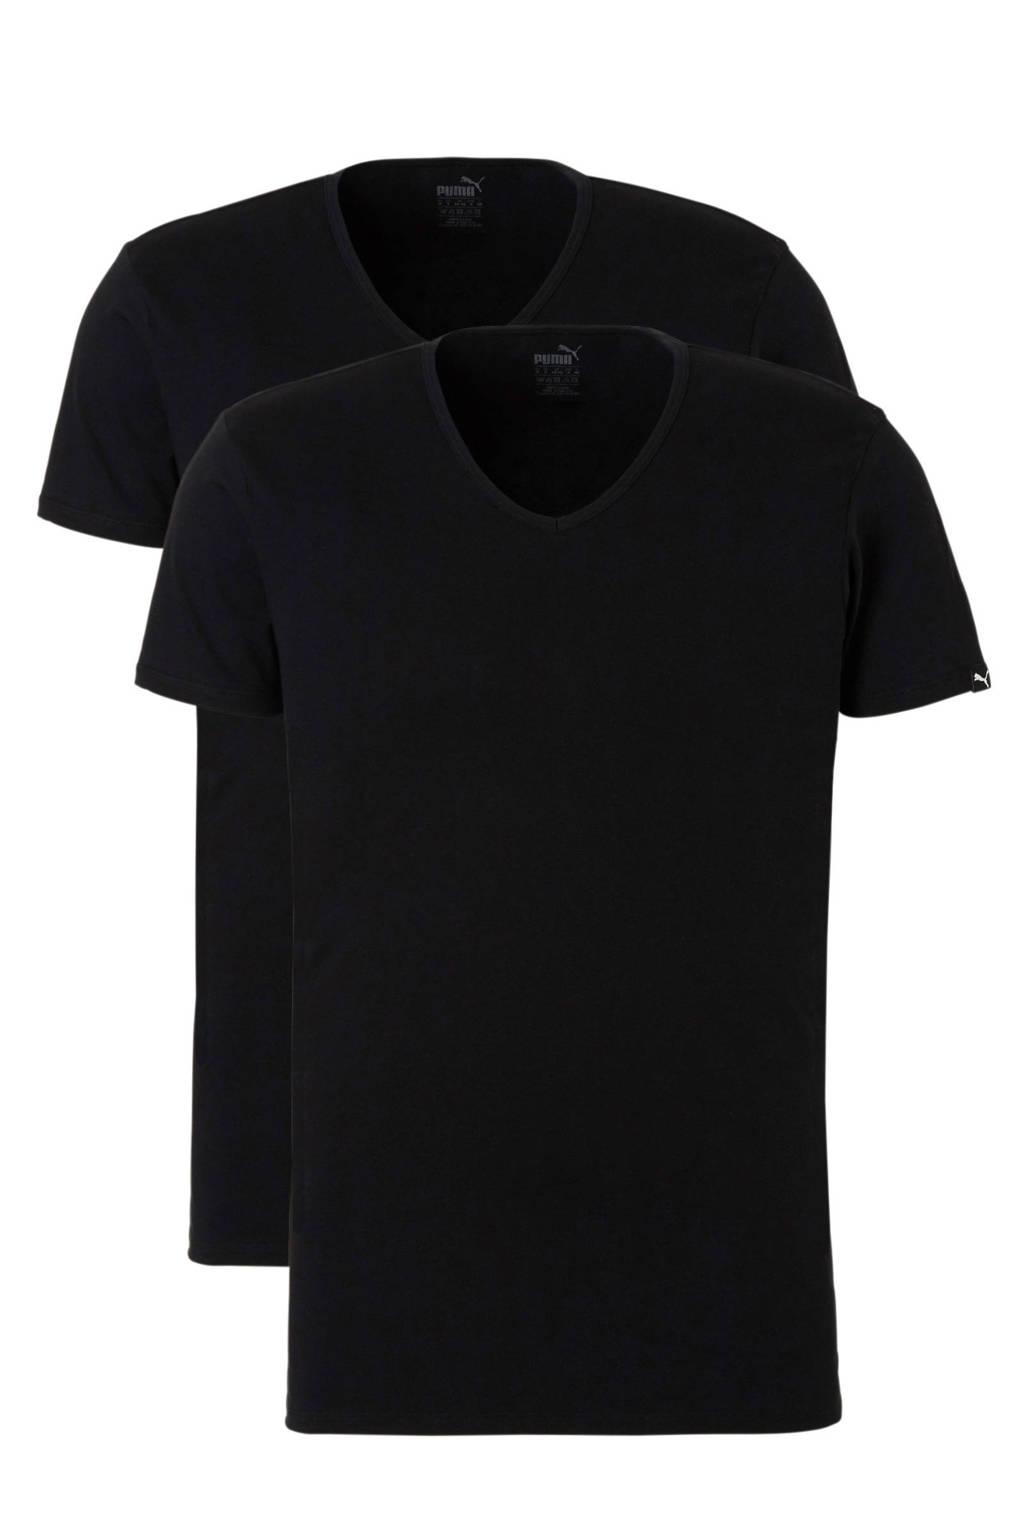 Puma T-shirt (set van 2), Zwart